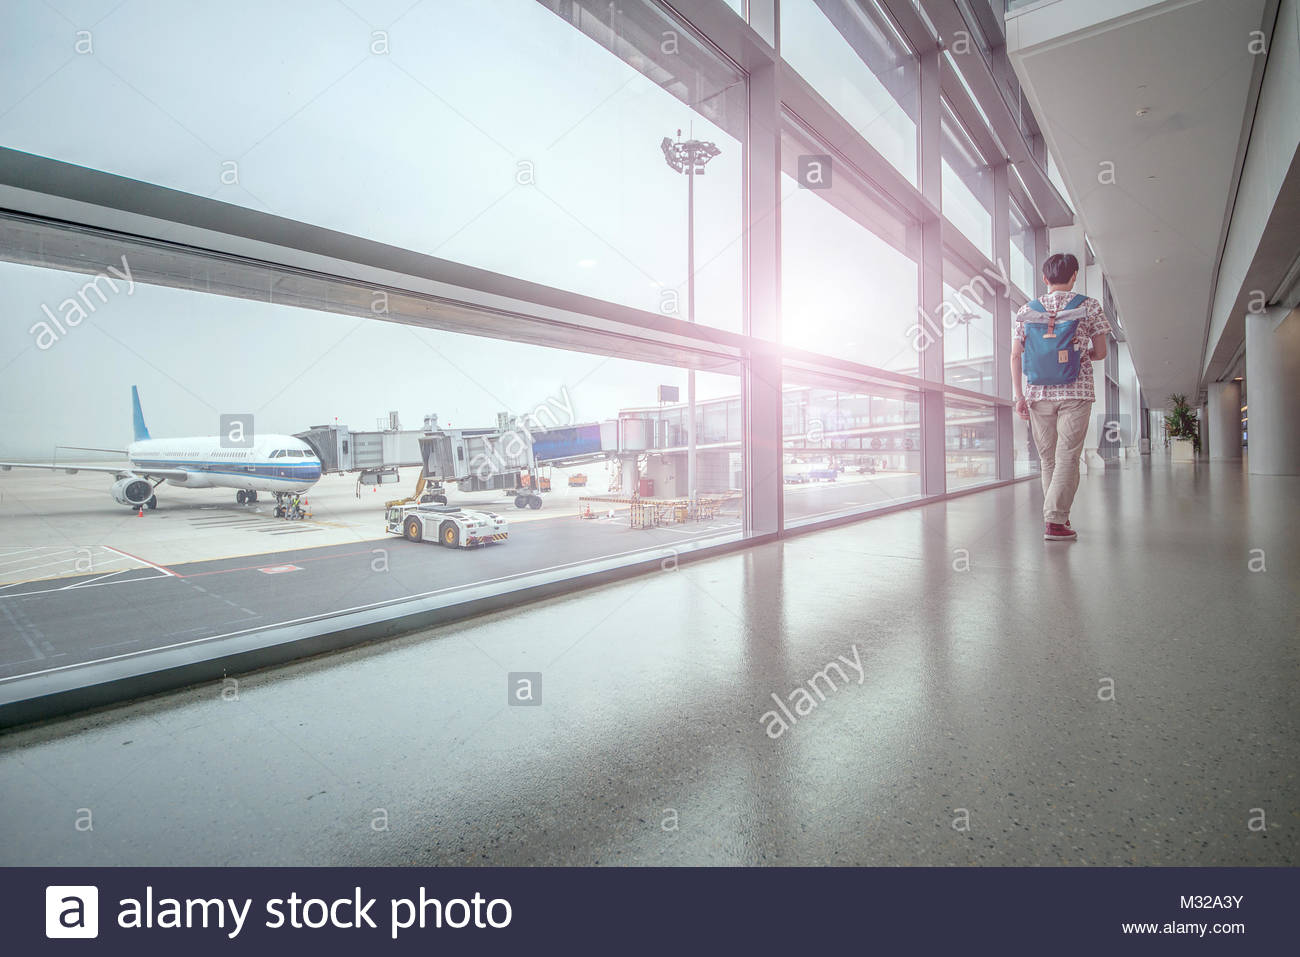 Waiting room, Los Angeles Airport, Boston, USA - Stock Image